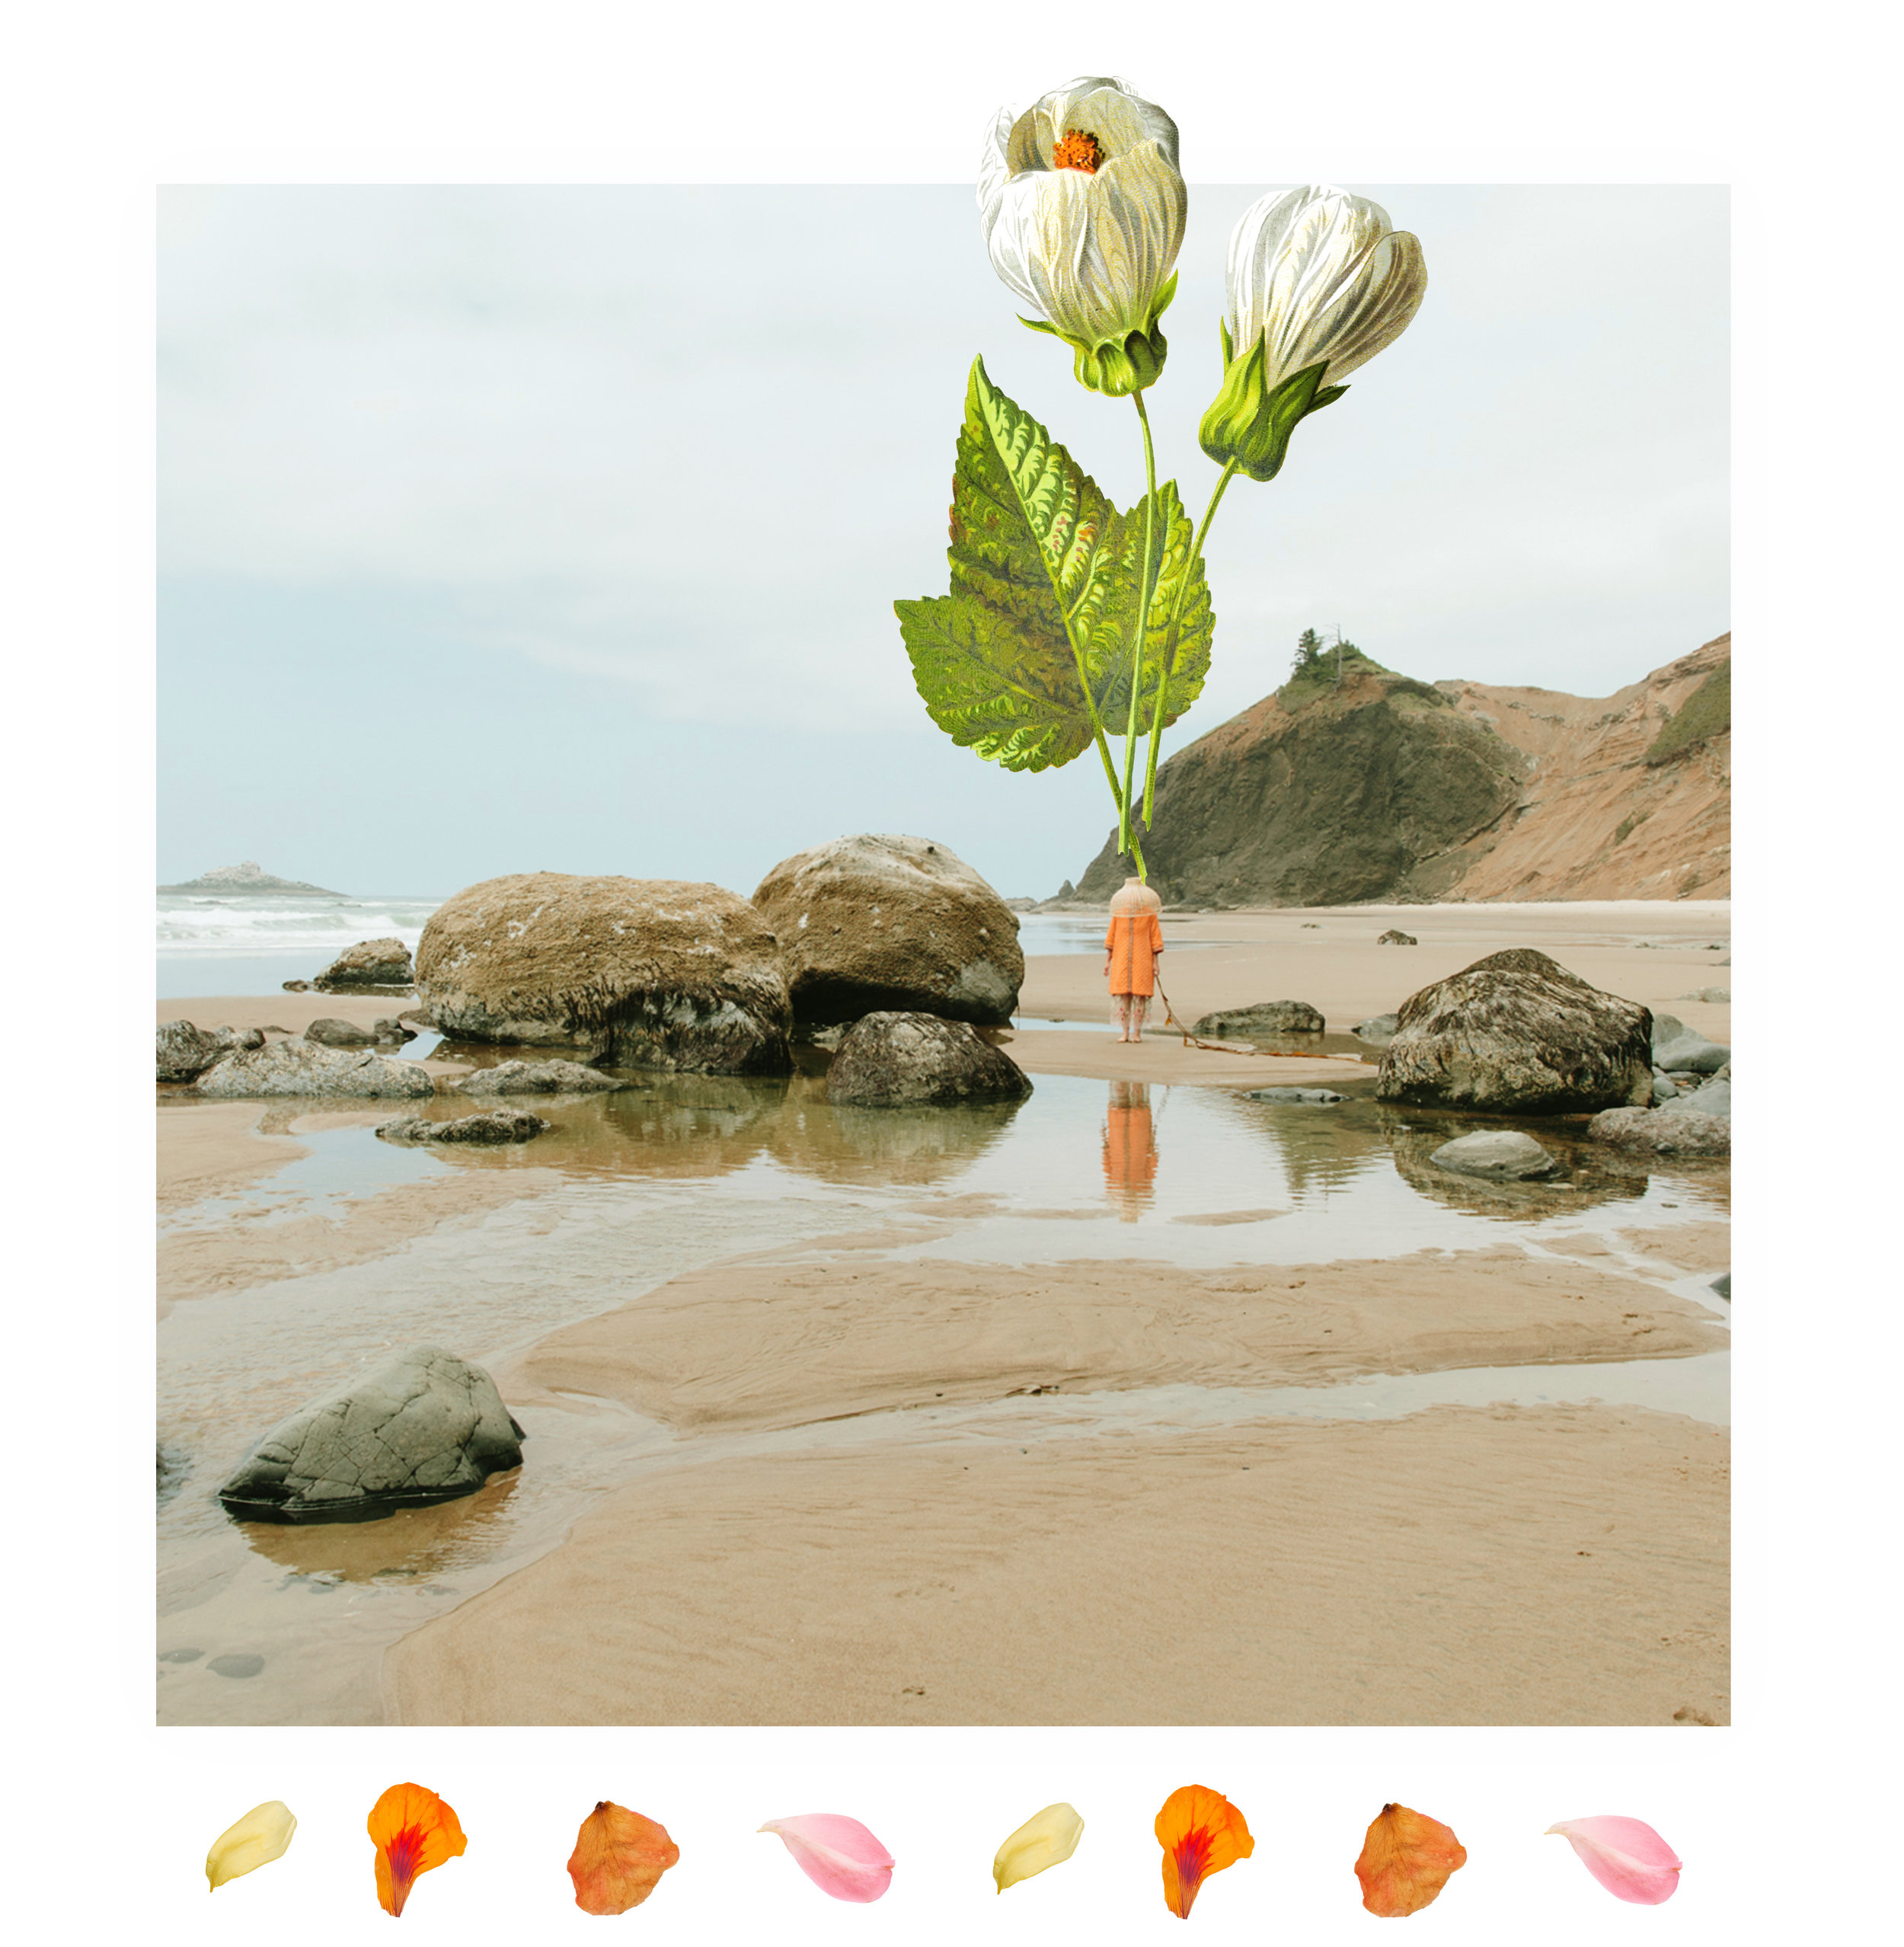 Beachcollage.jpg